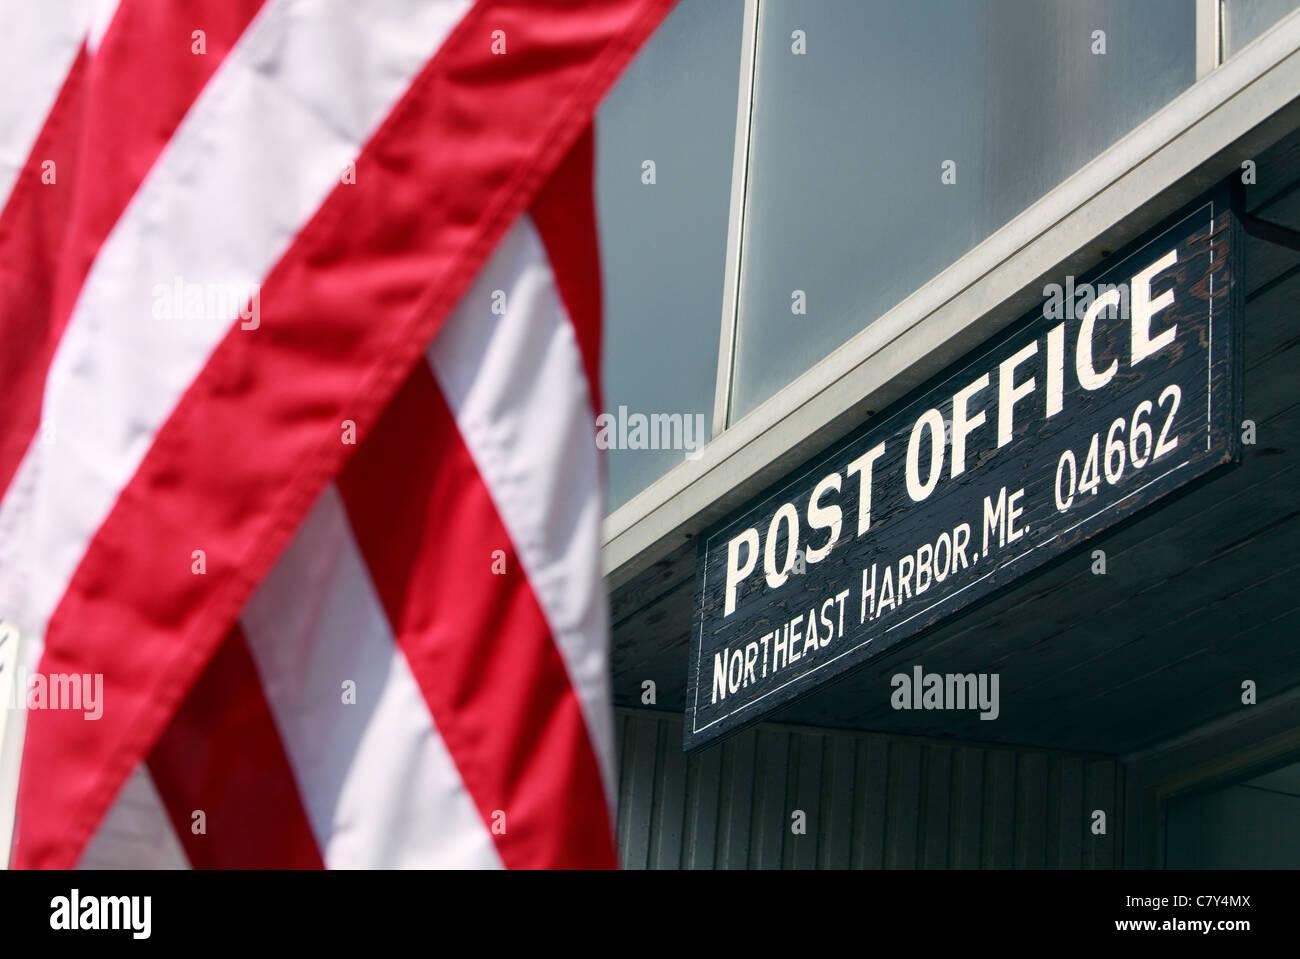 Post Office, Northeast Harbor, Maine - Stock Image